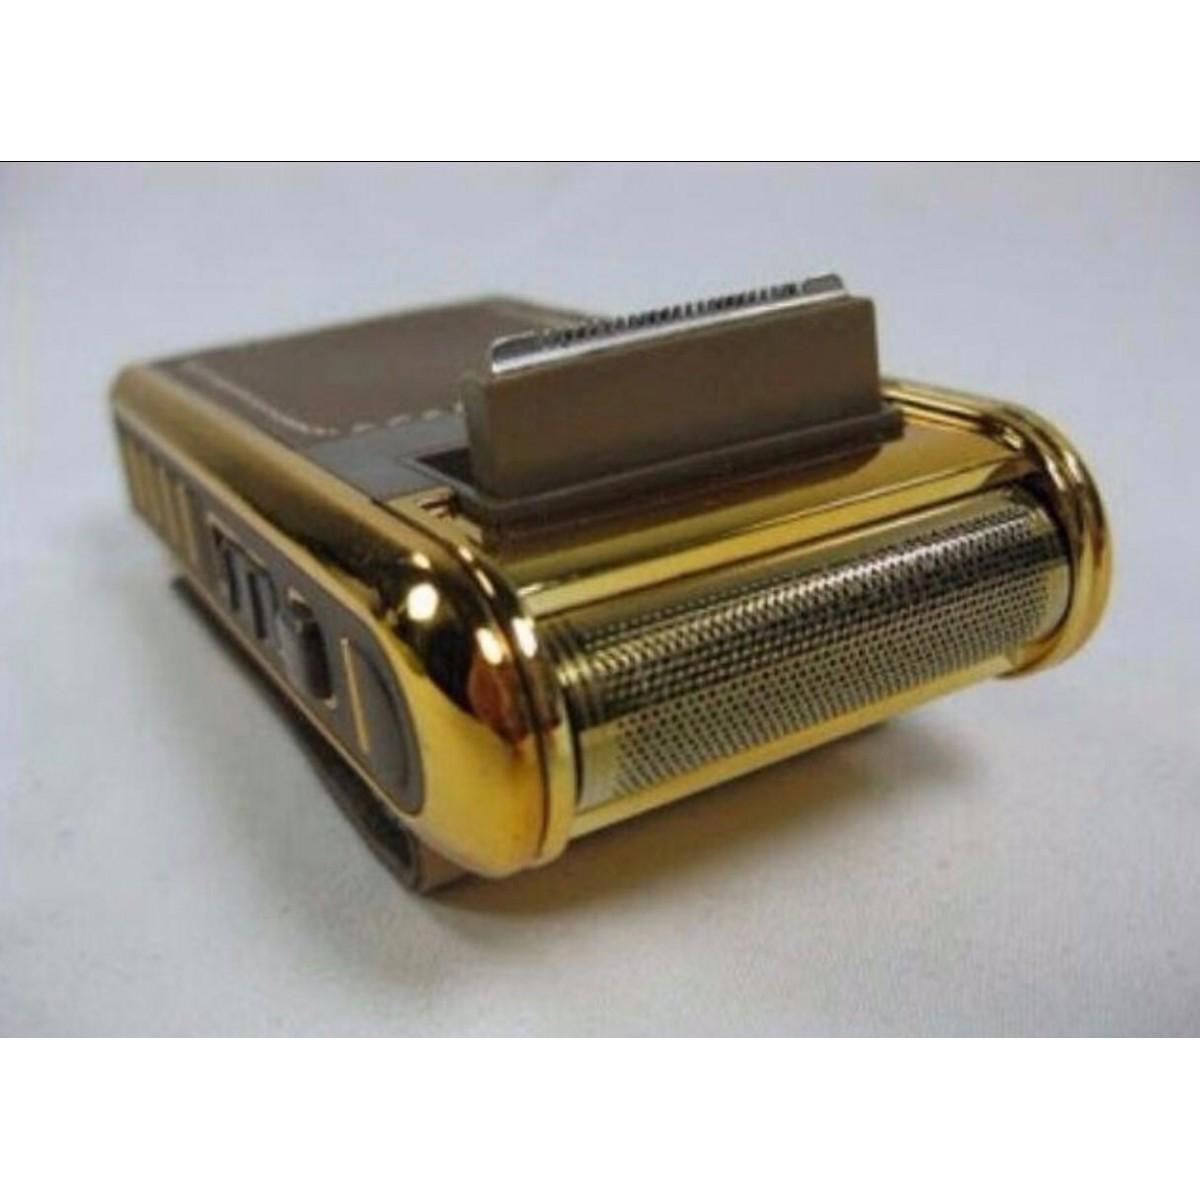 Barbeador Elétrico Máquina Shaver Kemei Rscw-5500 Bivol